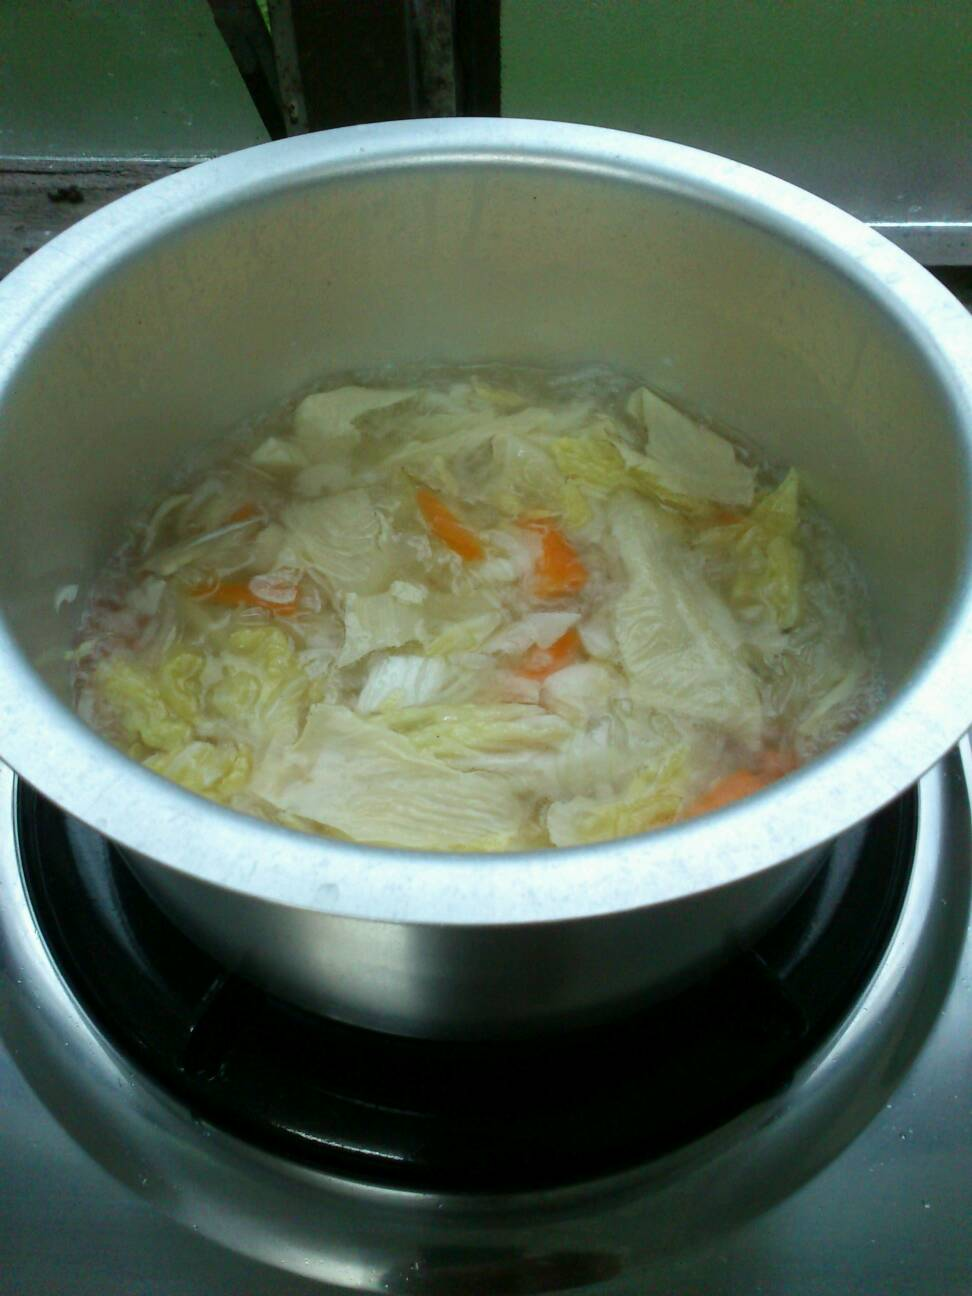 resepi masakan ayam berkuah  sedap resepi ayam Resepi Maggi Goreng Udang Enak dan Mudah